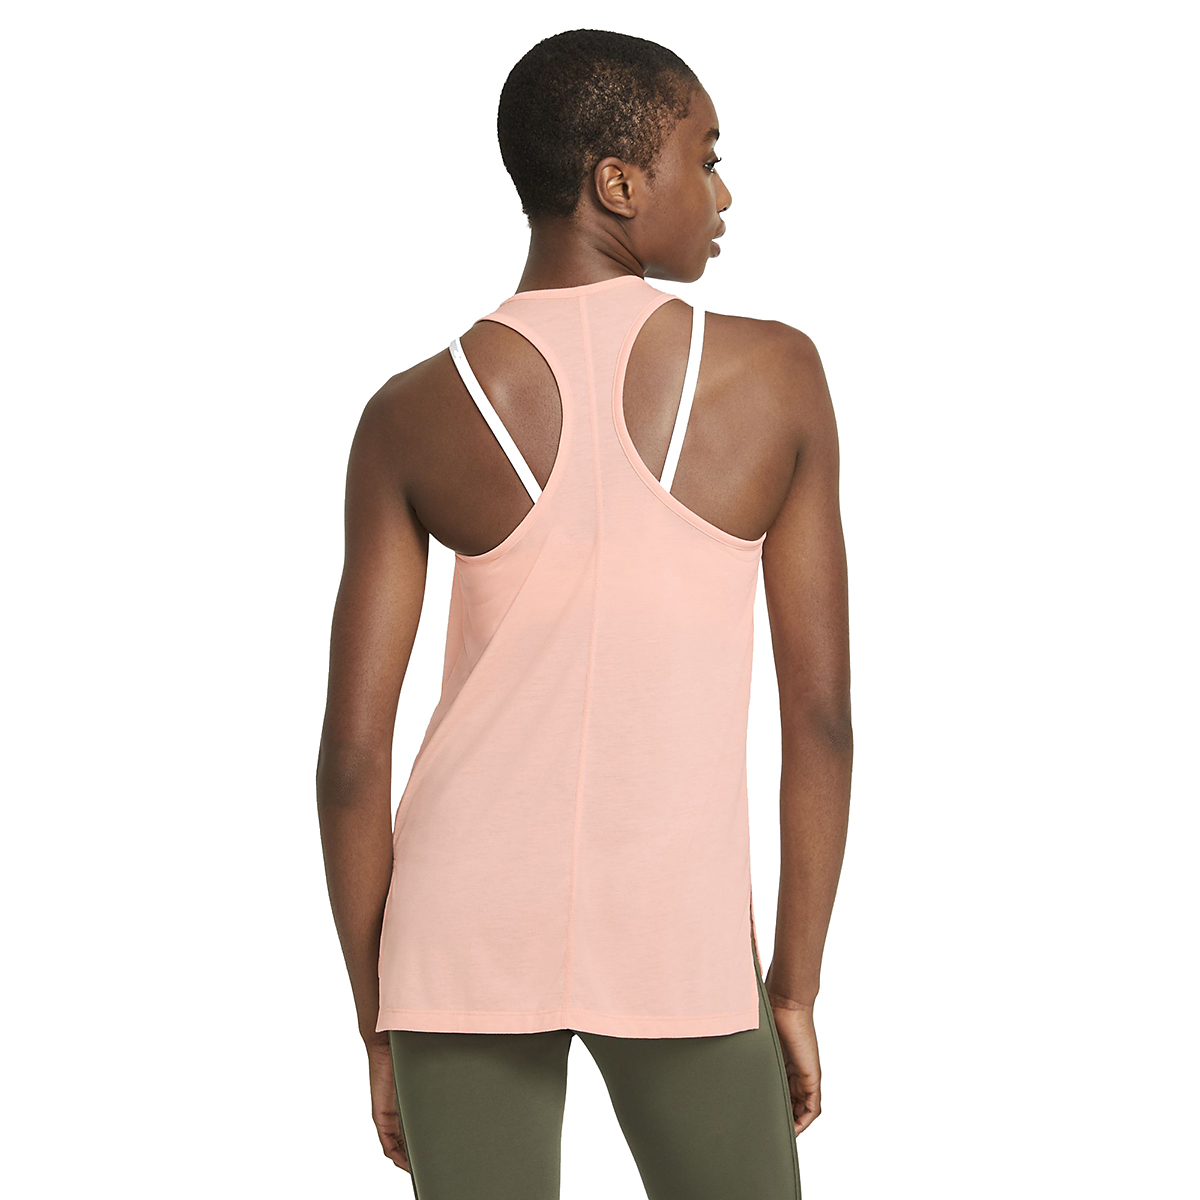 Women's Nike Yoga Layer Tank - Color: Arctic Orange - Size: XS, Arctic Orange, large, image 3